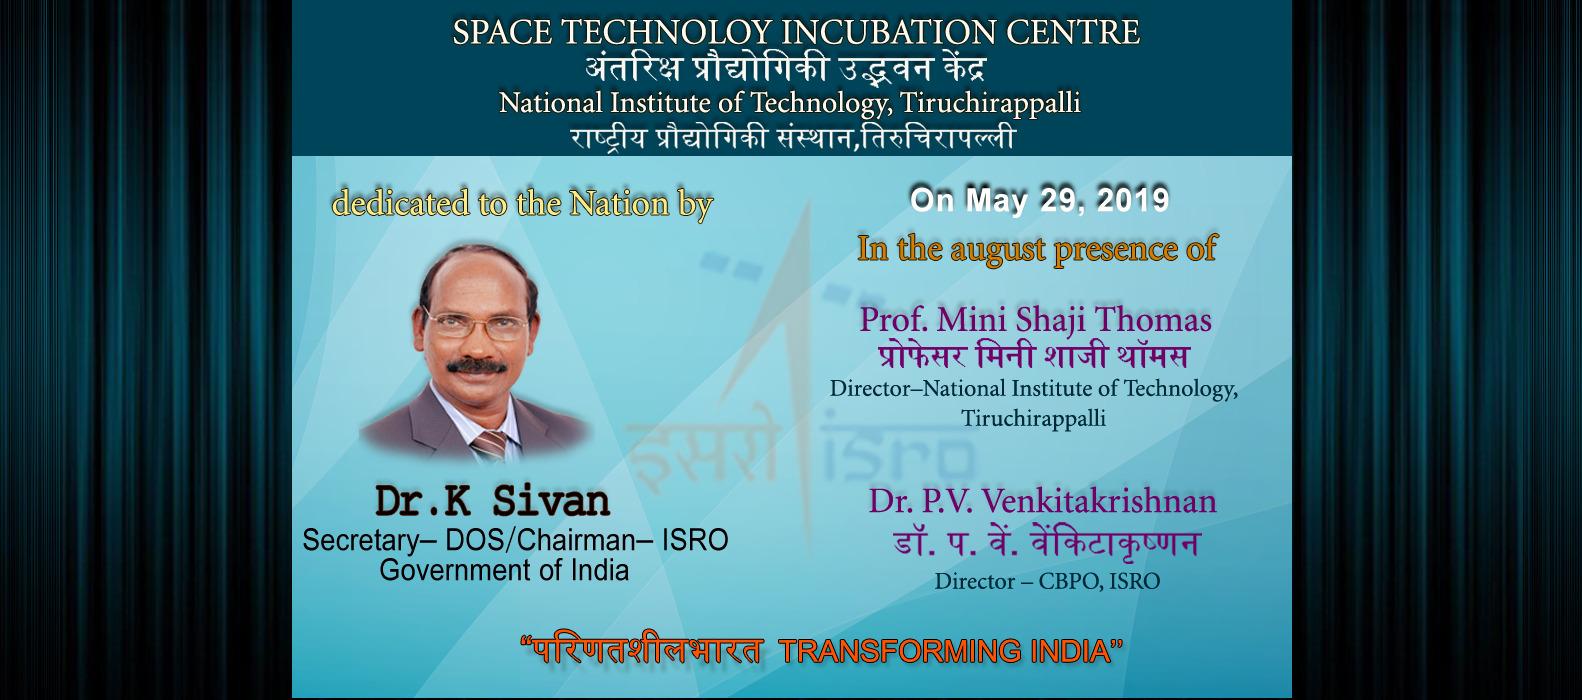 Space Incubation Centre at NIT- Tiruchirappalli